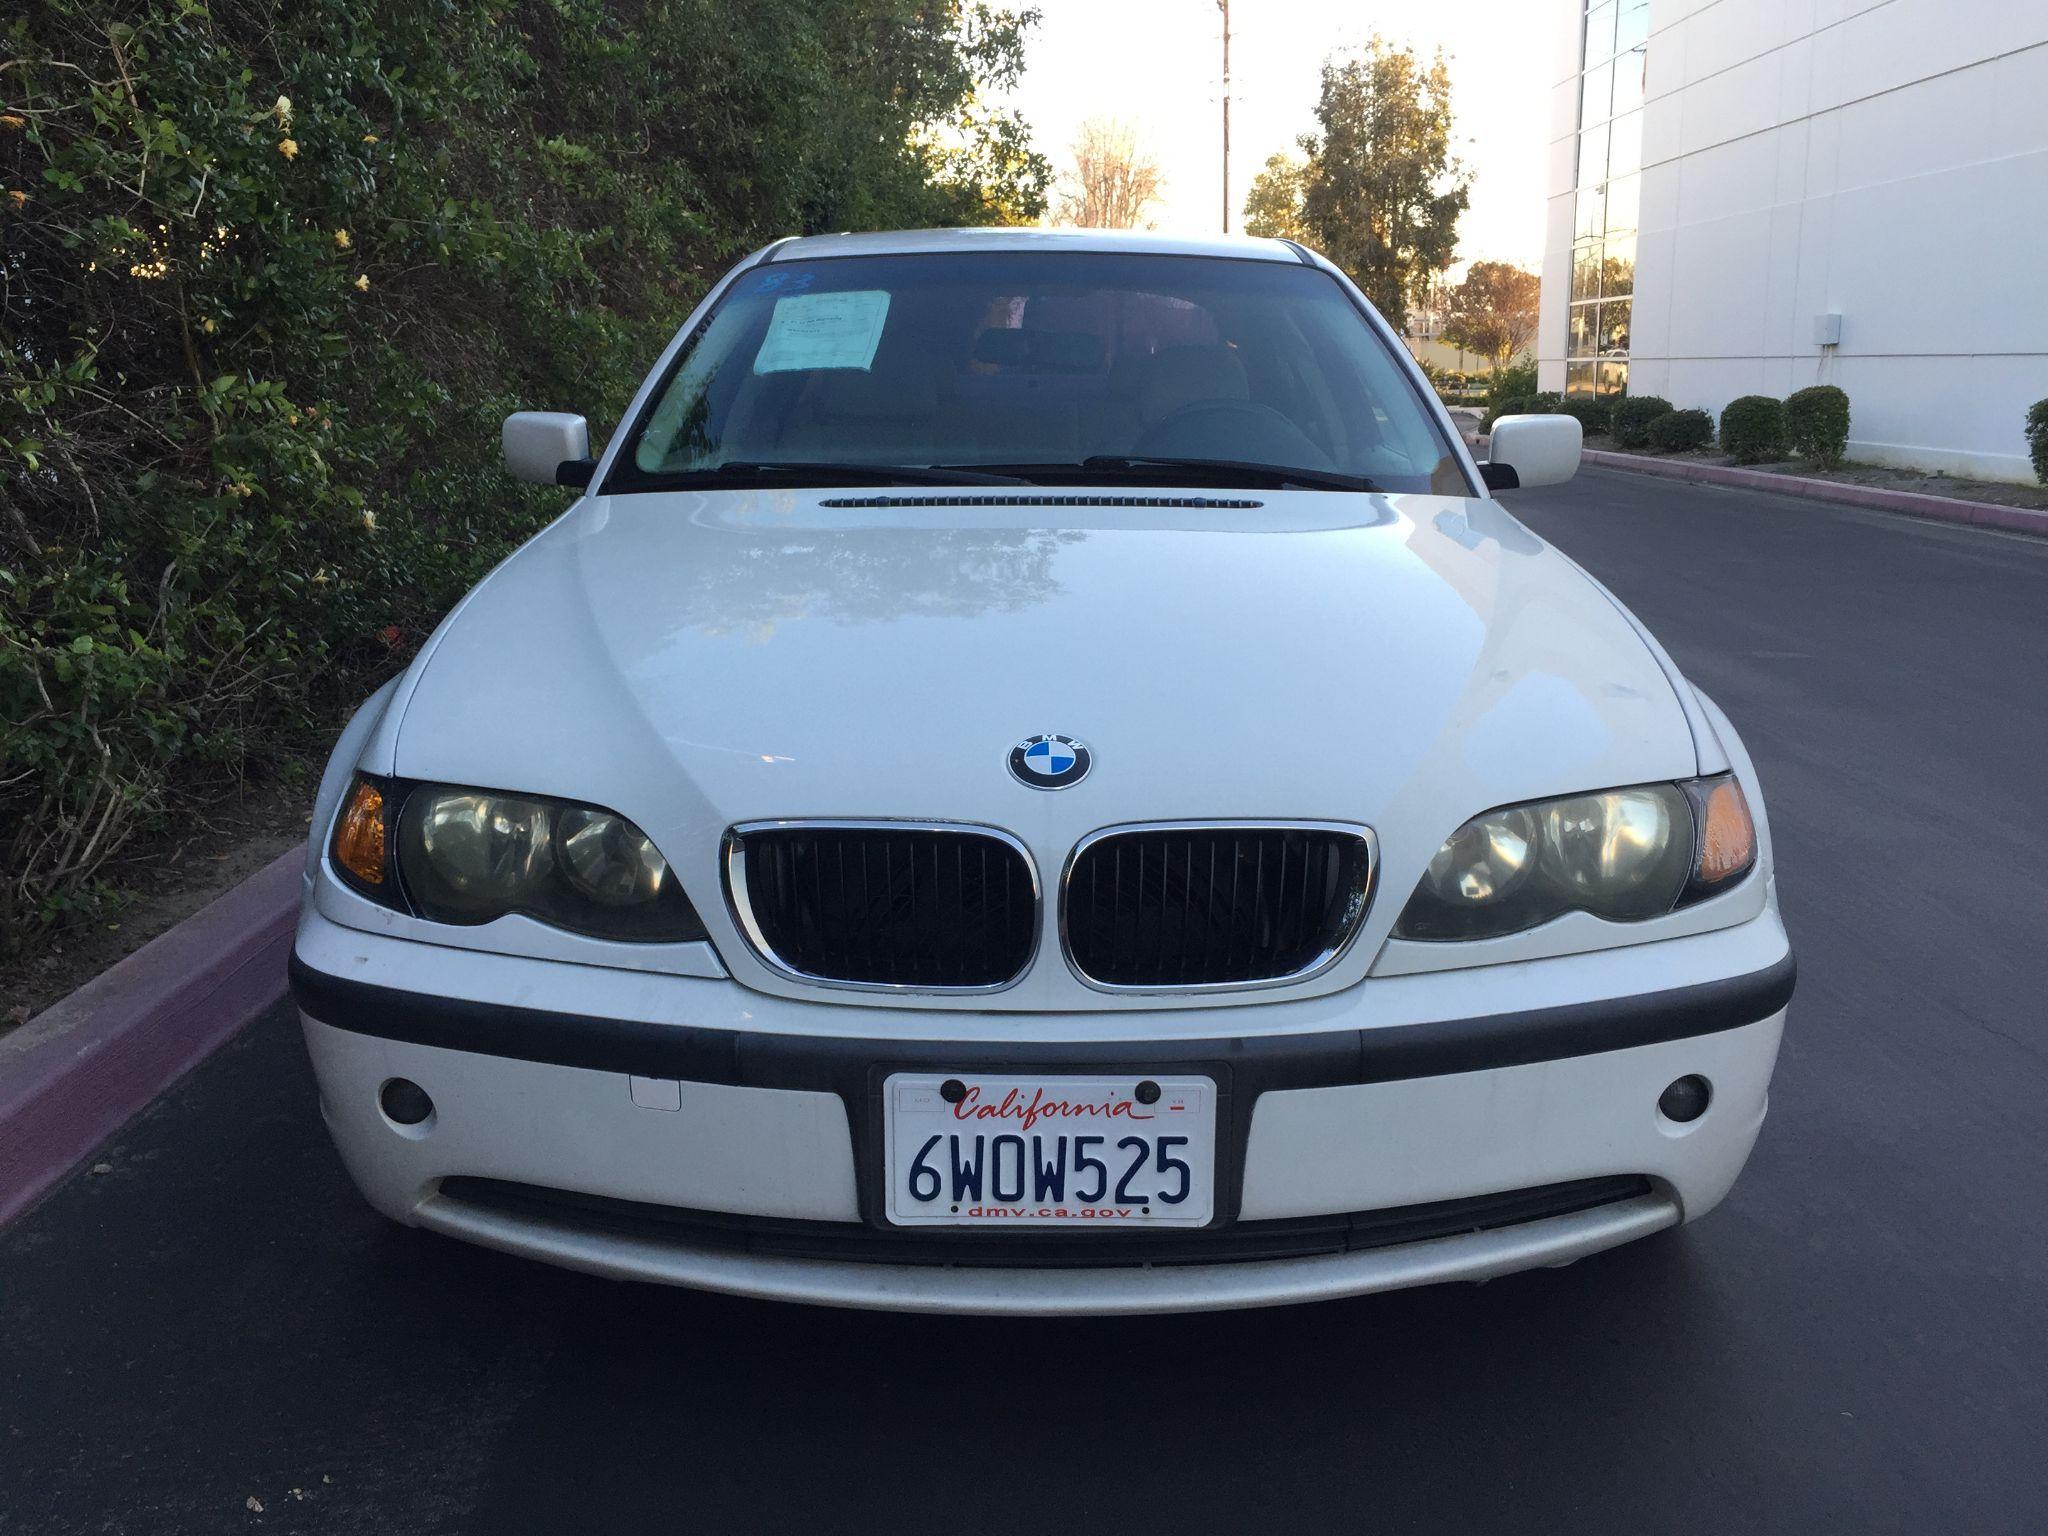 Used BMW I WSUNROOF At City Cars Warehouse INC - Bmw 325i 2002 price